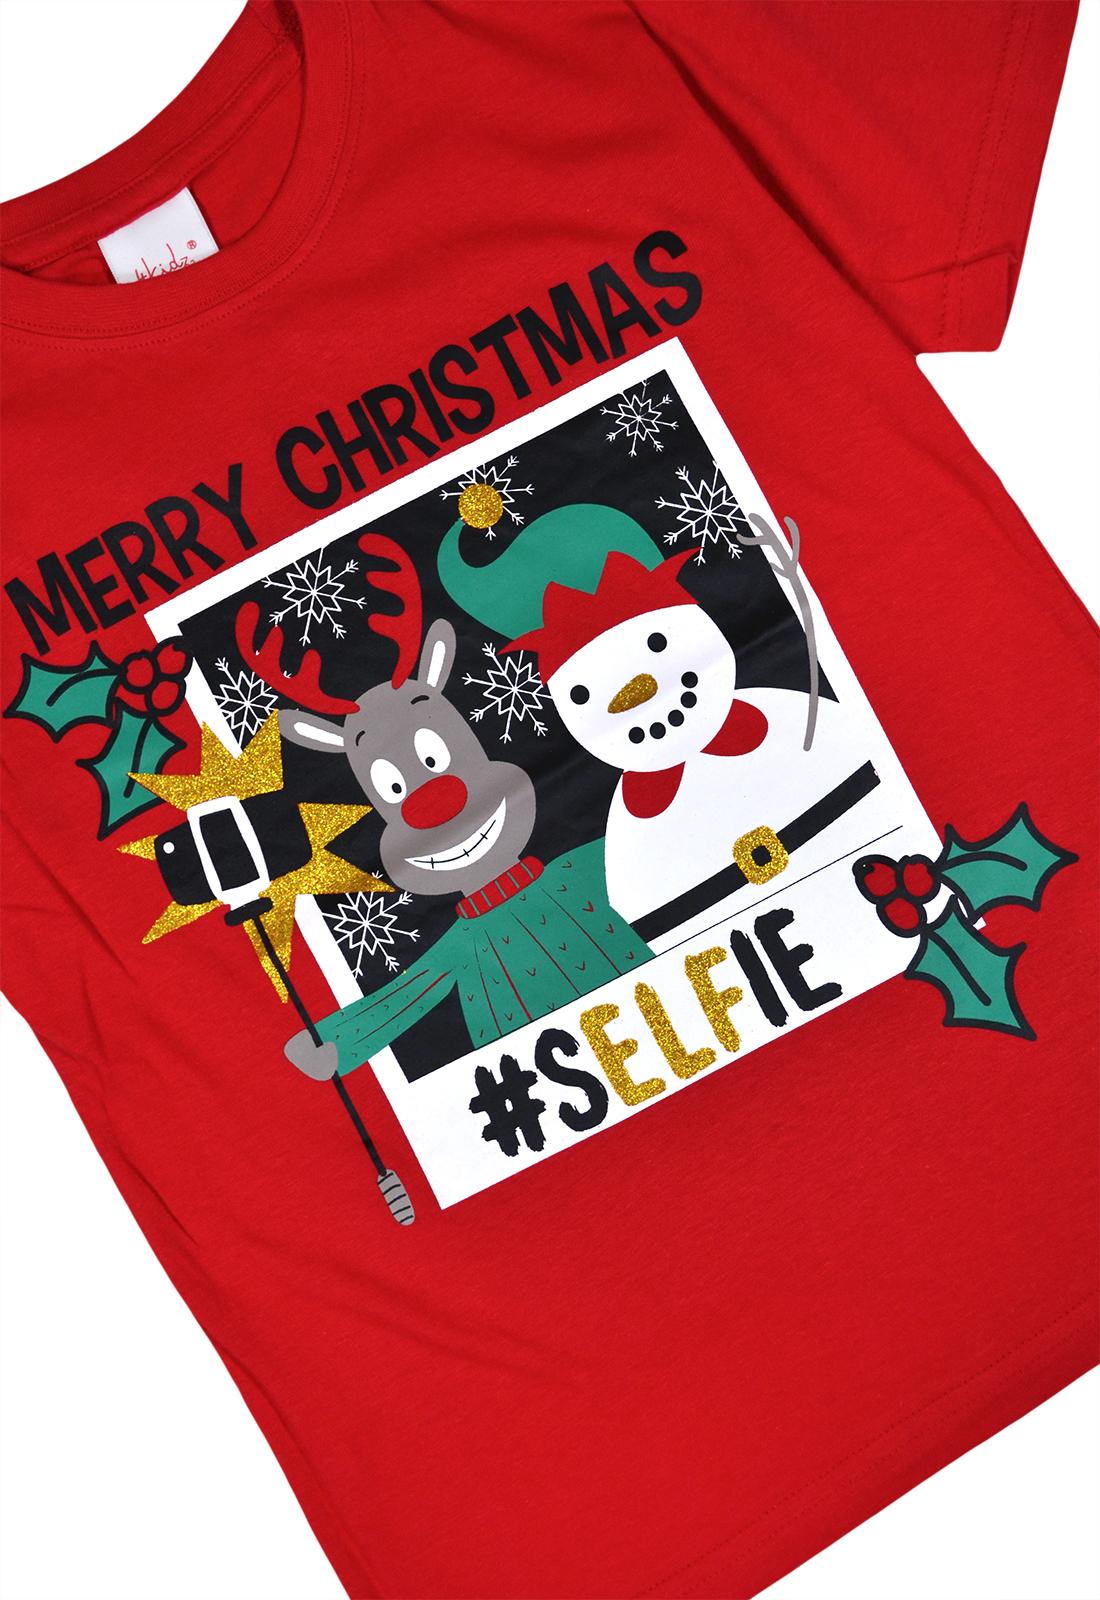 Filles-Garcons-Noel-t-shirts-enfants-Noel-Top-Rouge-Bleu-Marine-Age-7-8-9-10-11-12-13-ans miniature 3